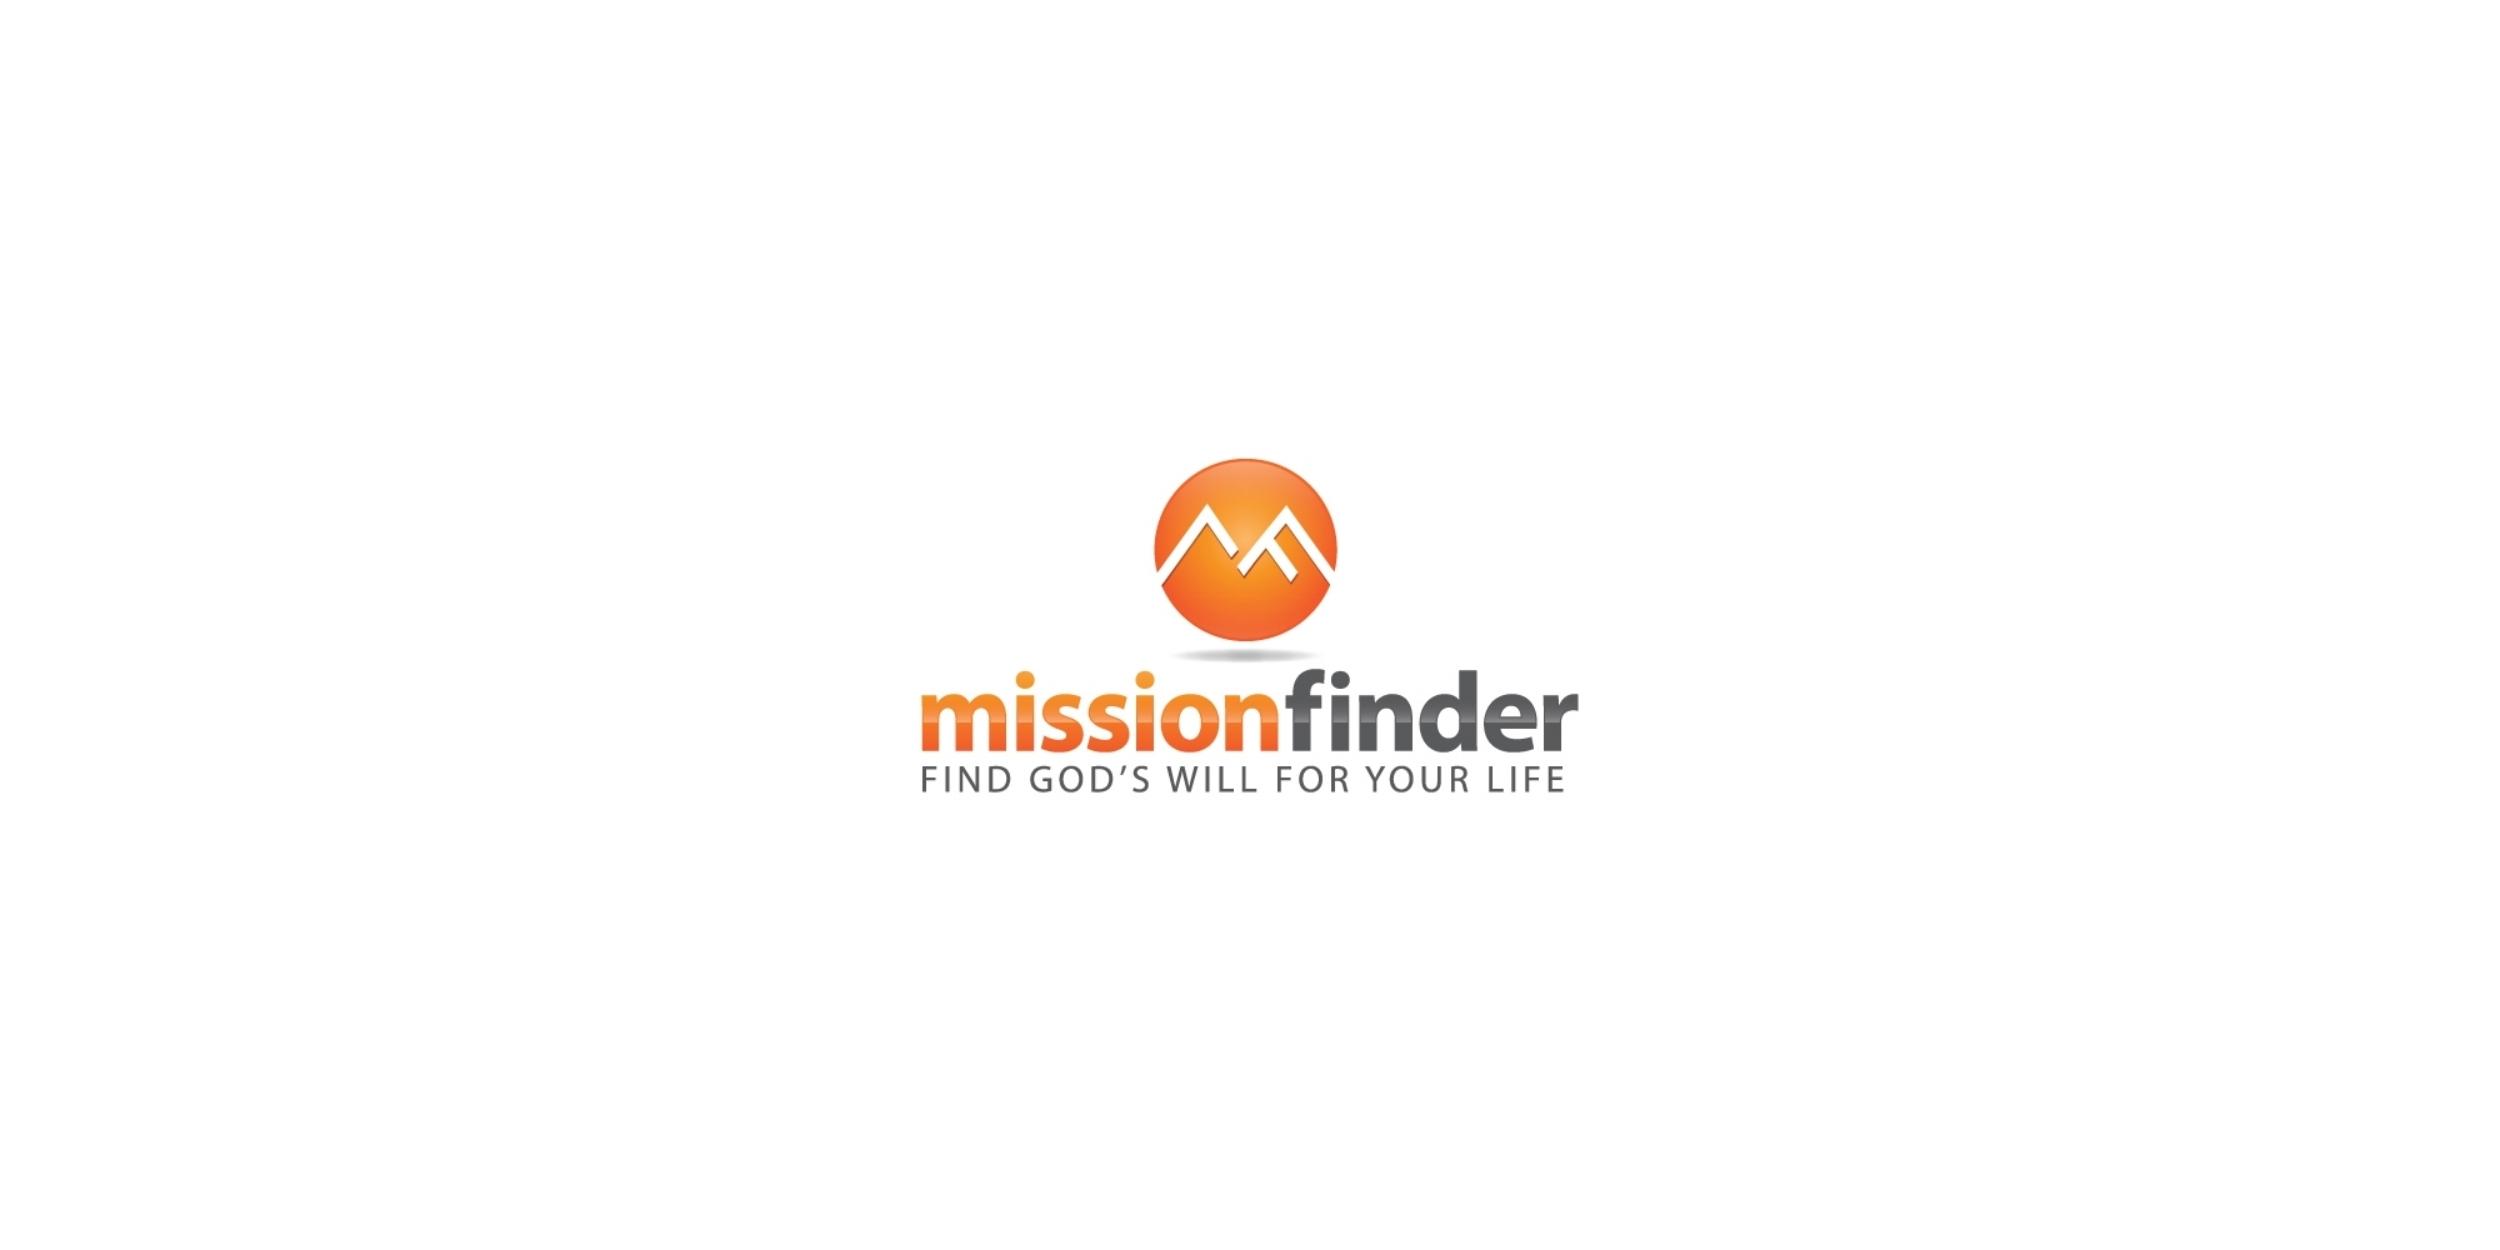 www.missionfinder.org